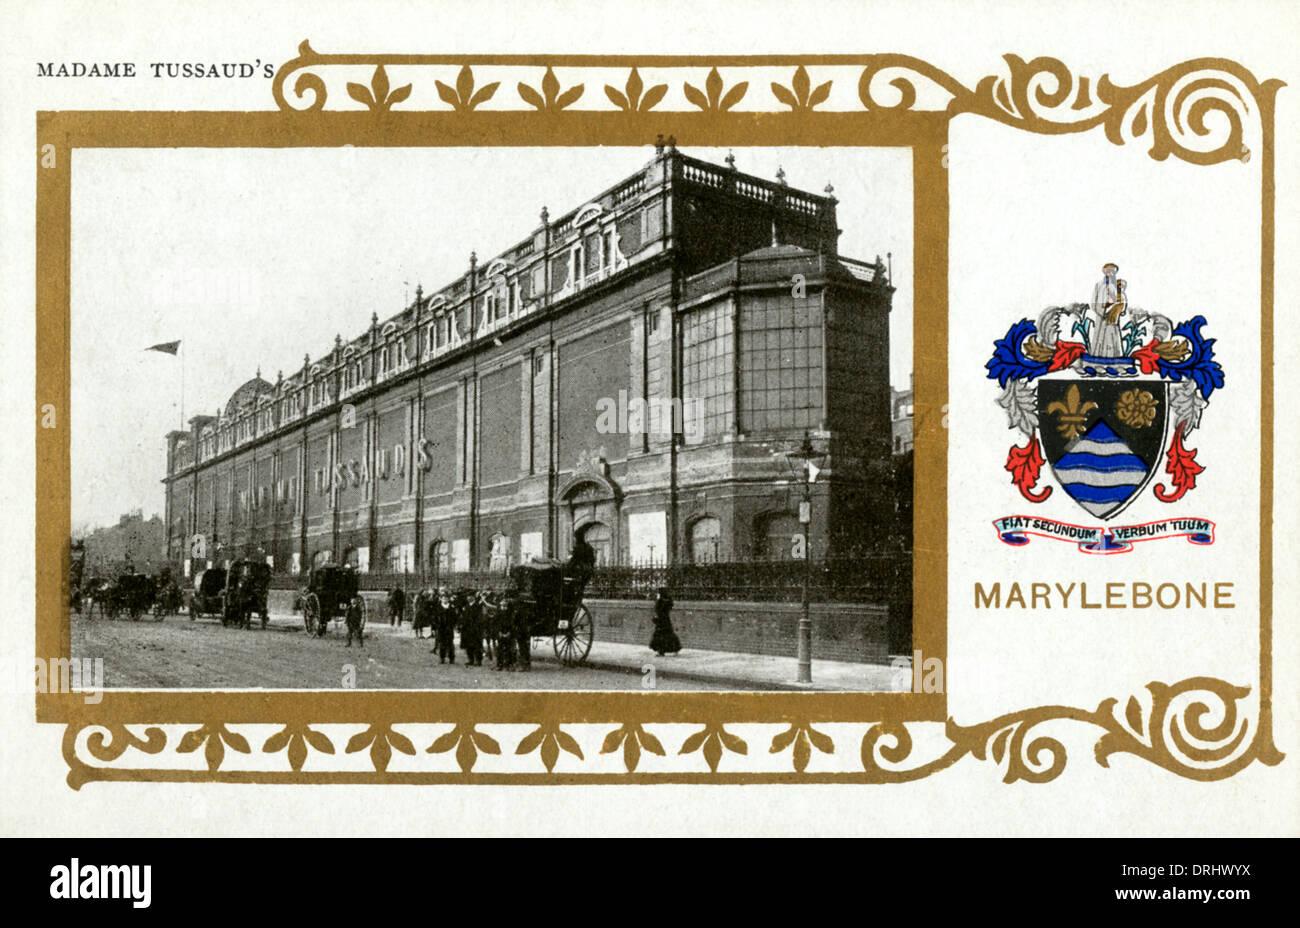 Madame Tussauds waxwork museum - Stock Image